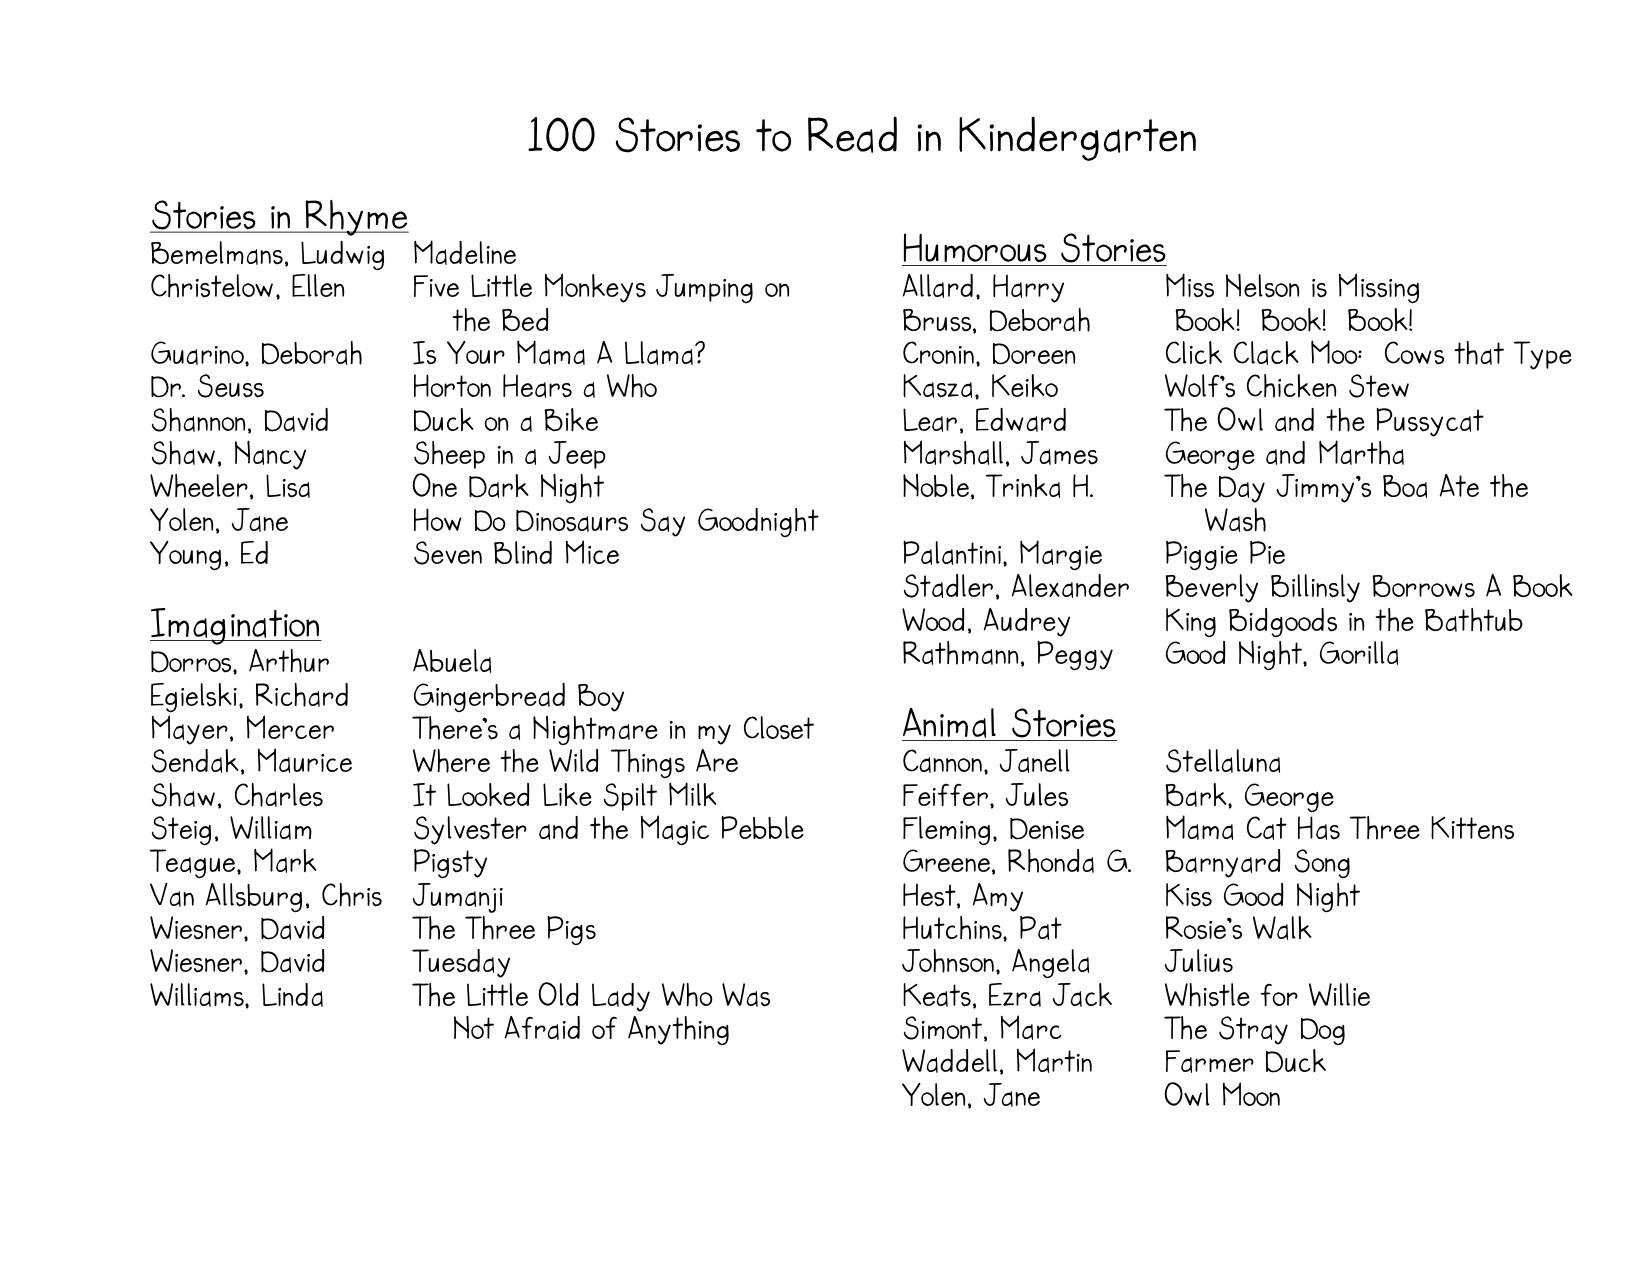 worksheet Kindergarten Reading similiar 100 books to read in kindergarten keywords kdg 2